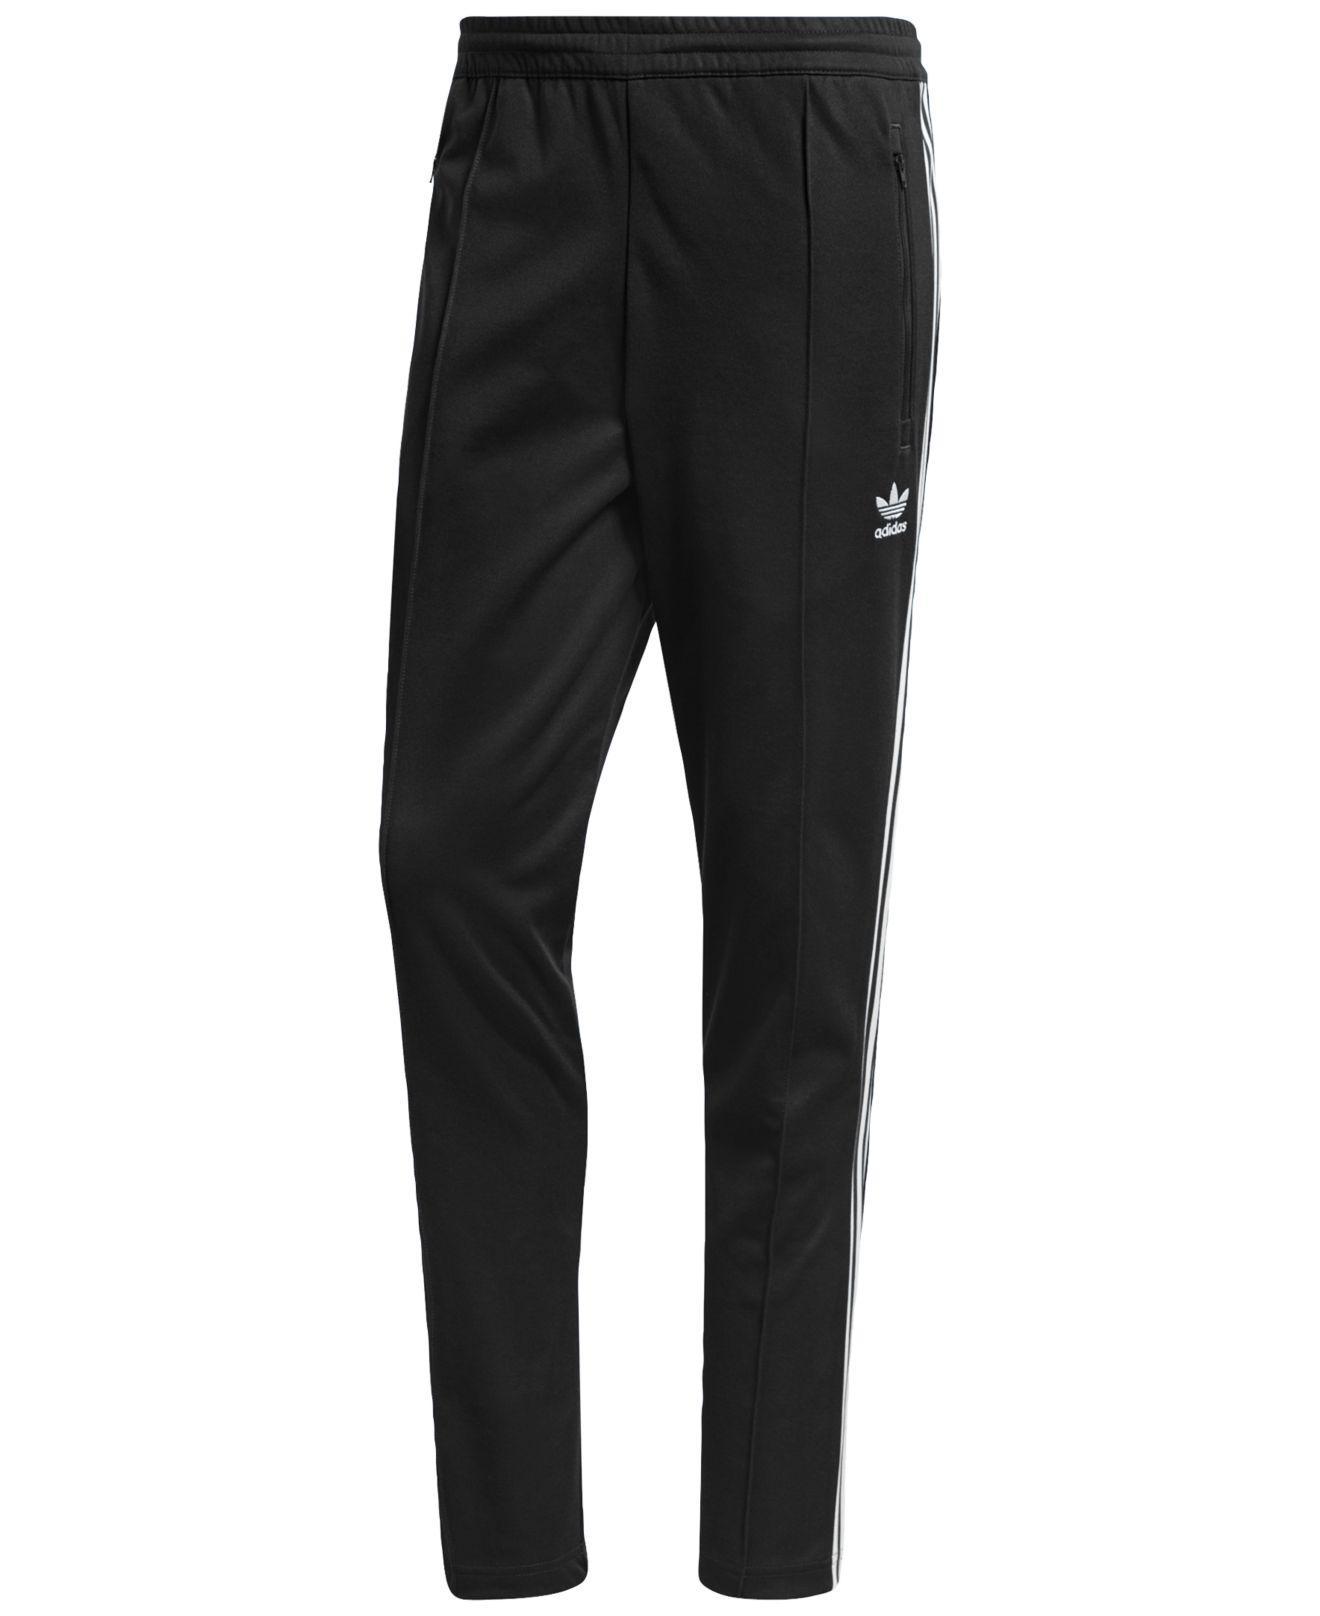 fc8c916080e Lyst - adidas Originals Men s Originals Beckenbauer Track Pants in ...